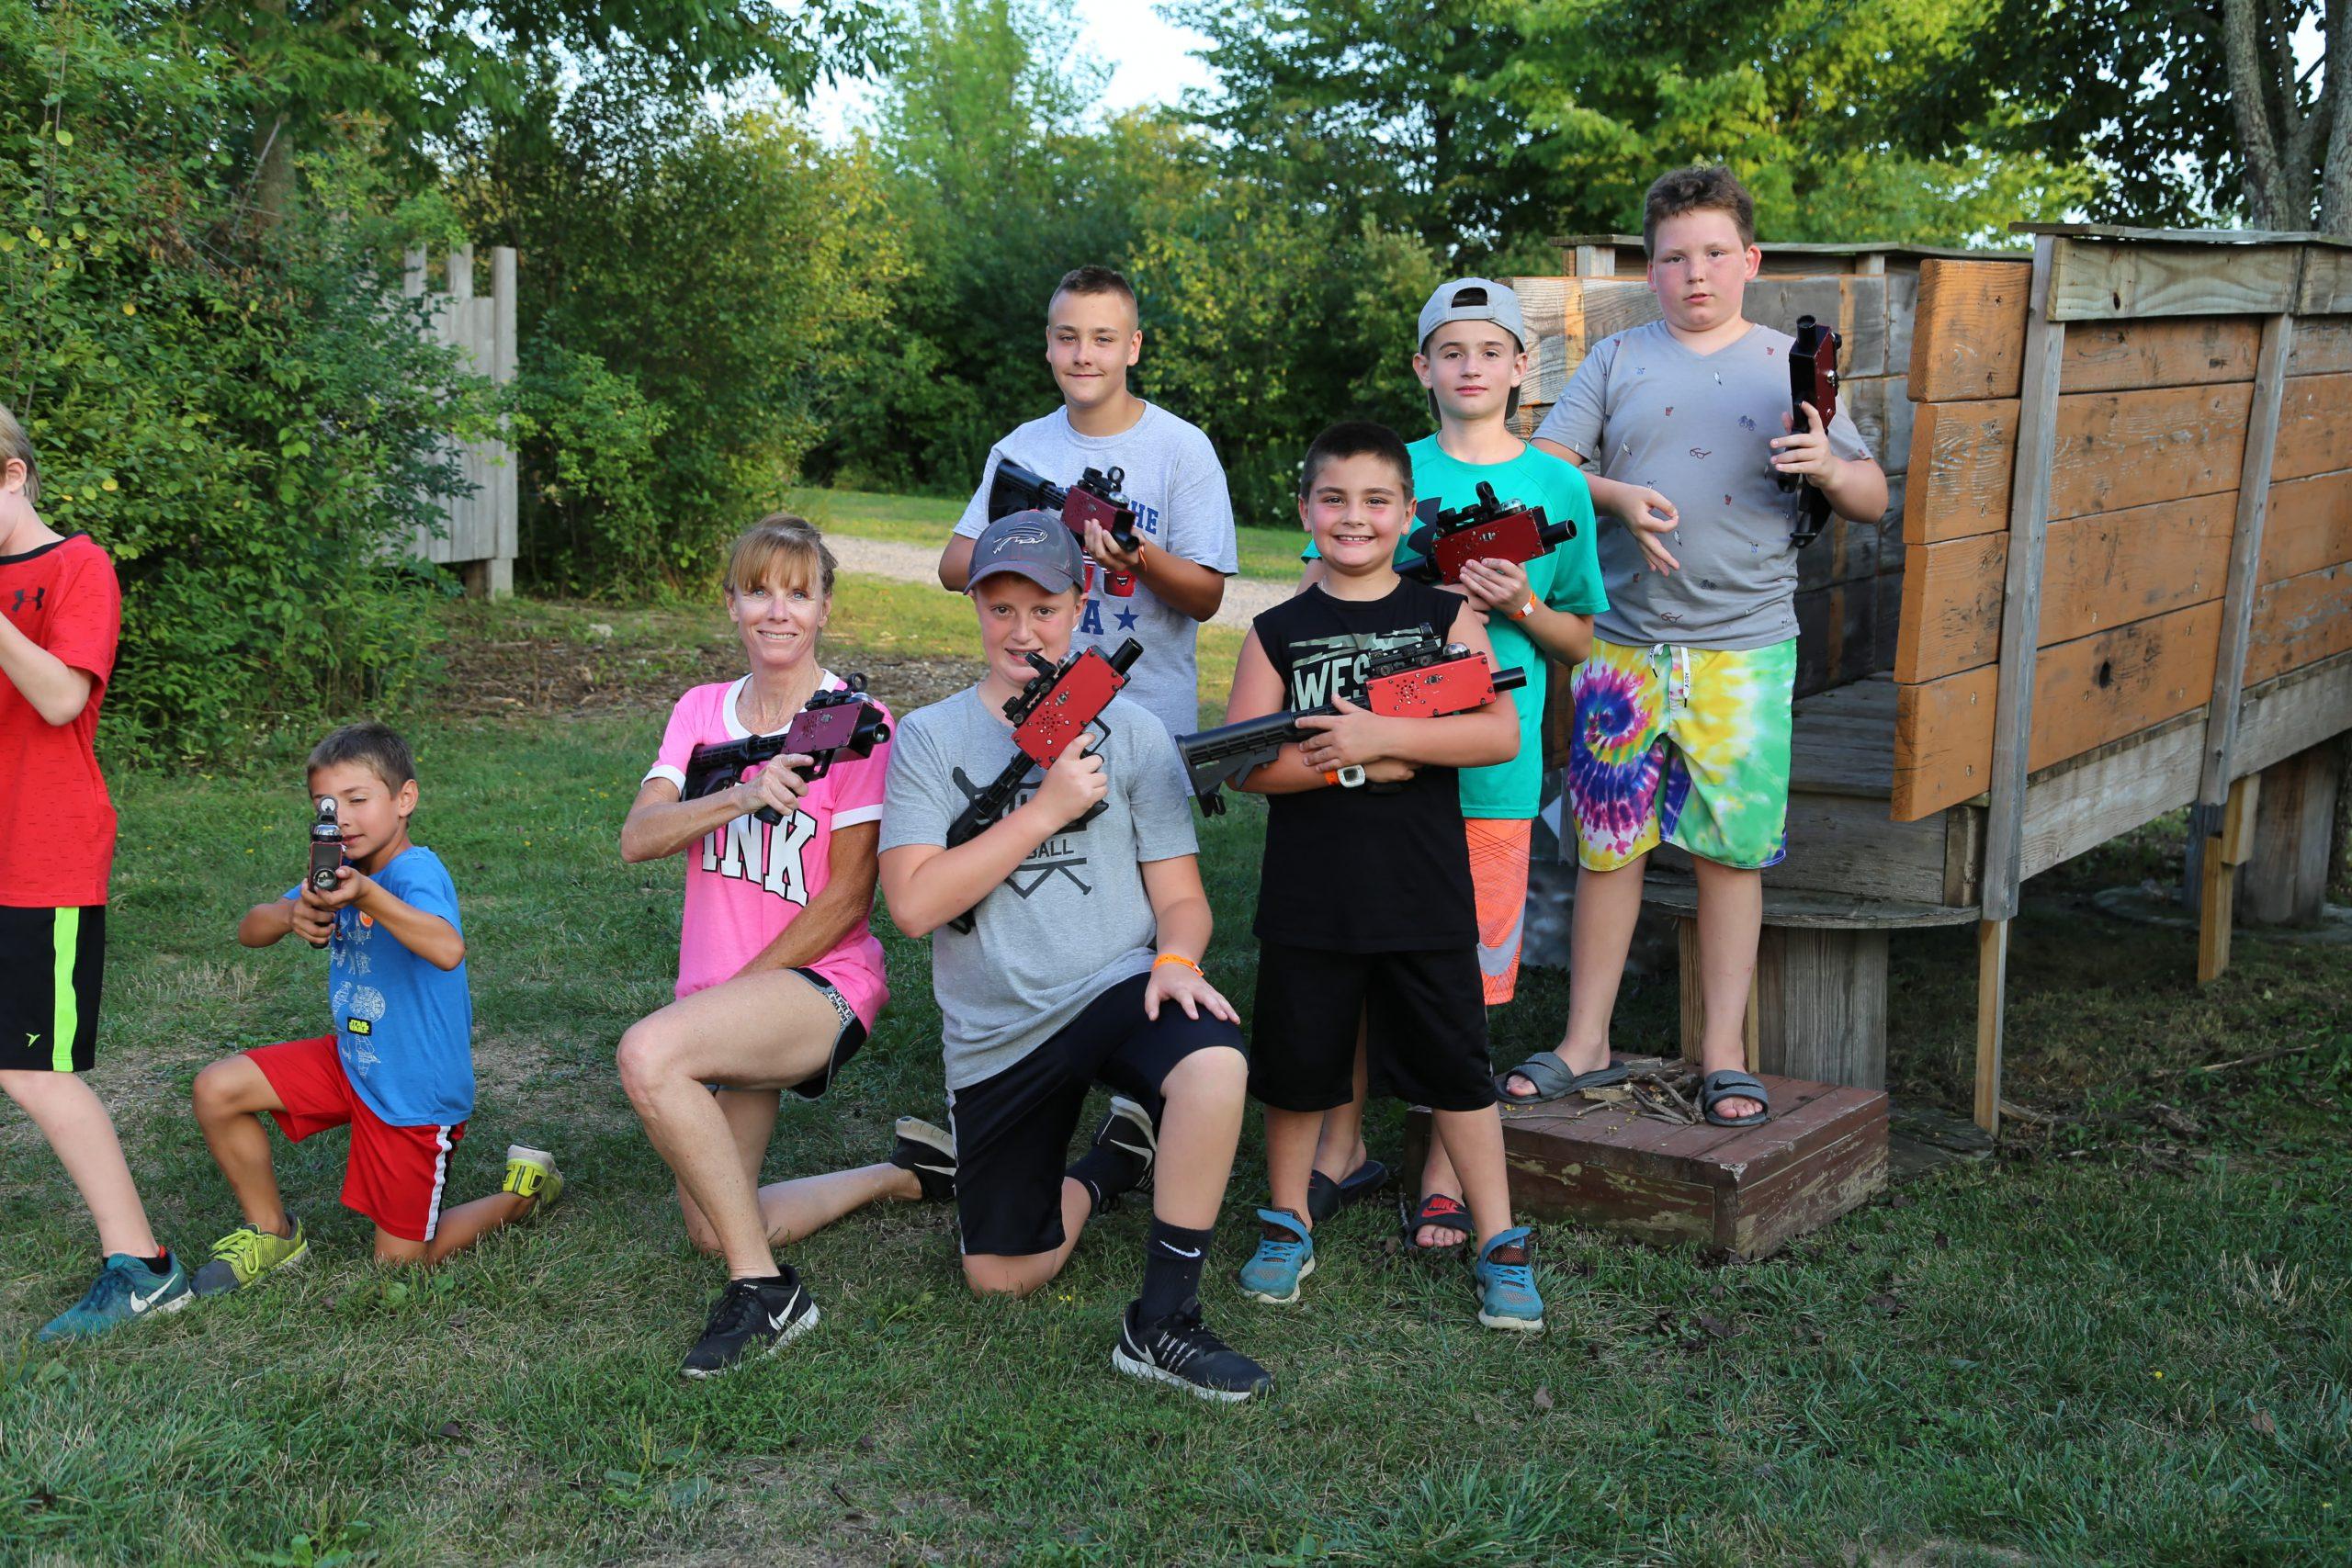 team of kids playing laser tag